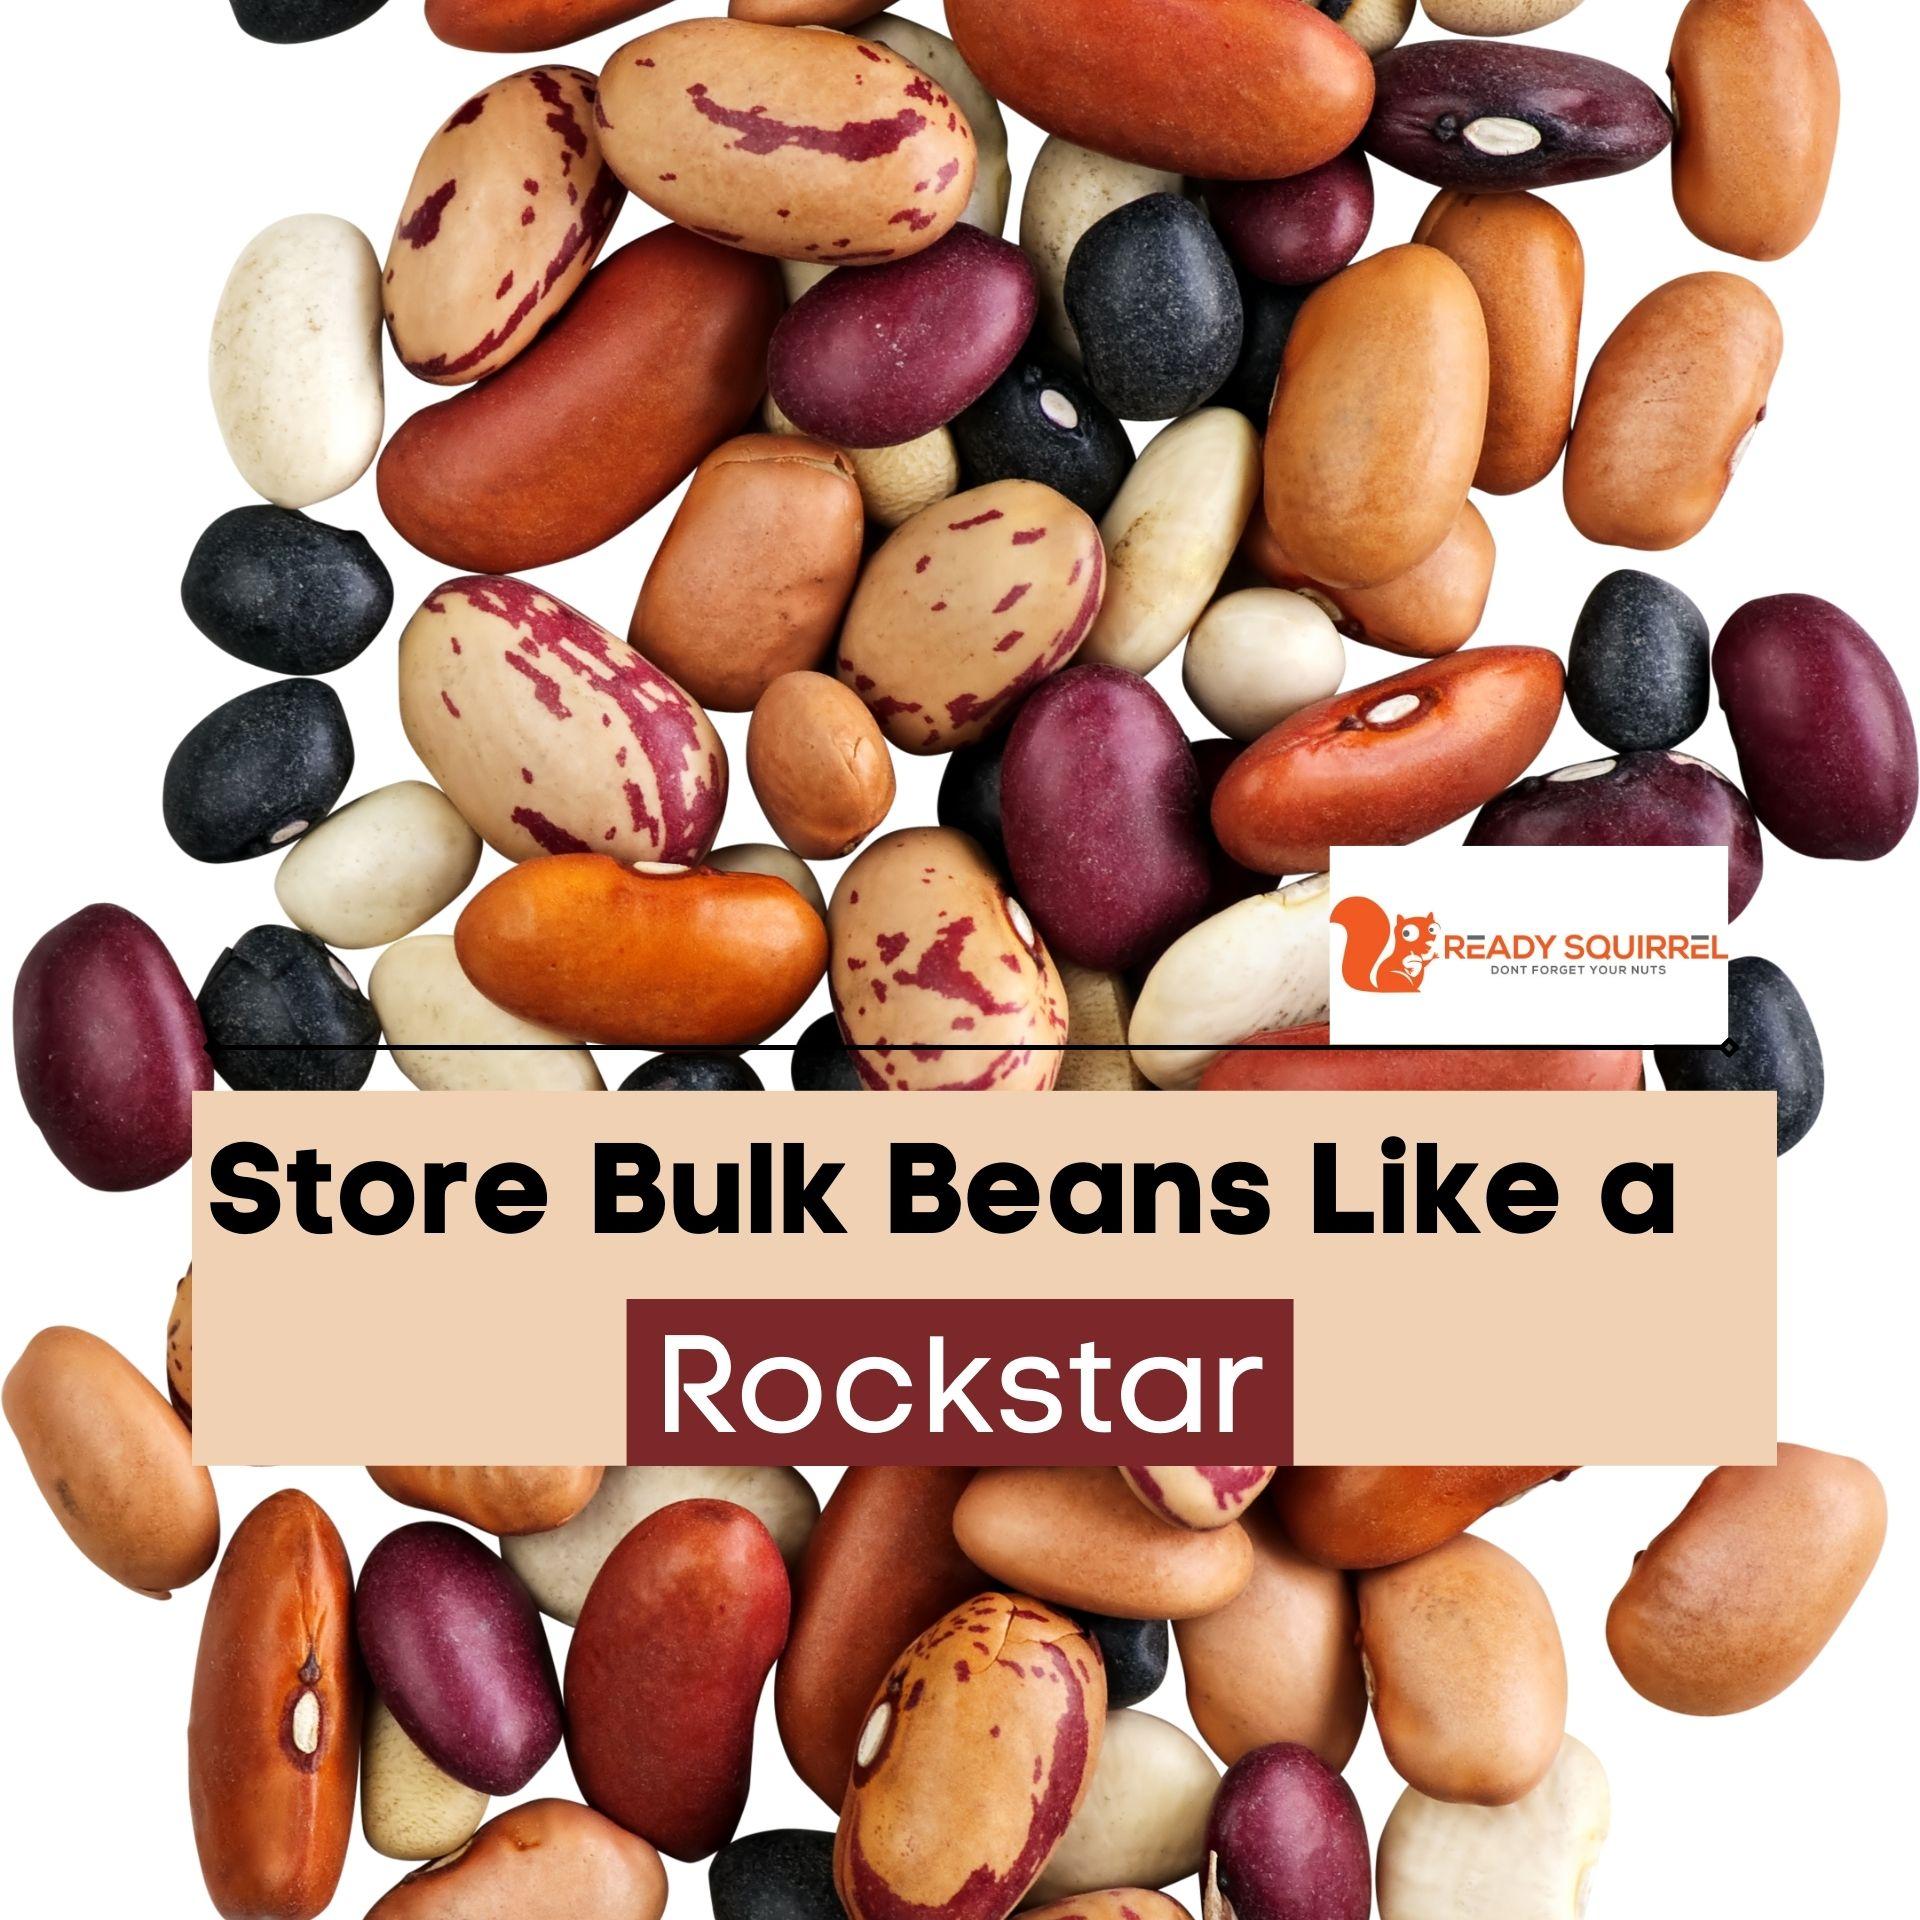 Store Bulk Beans Like a Rockstar